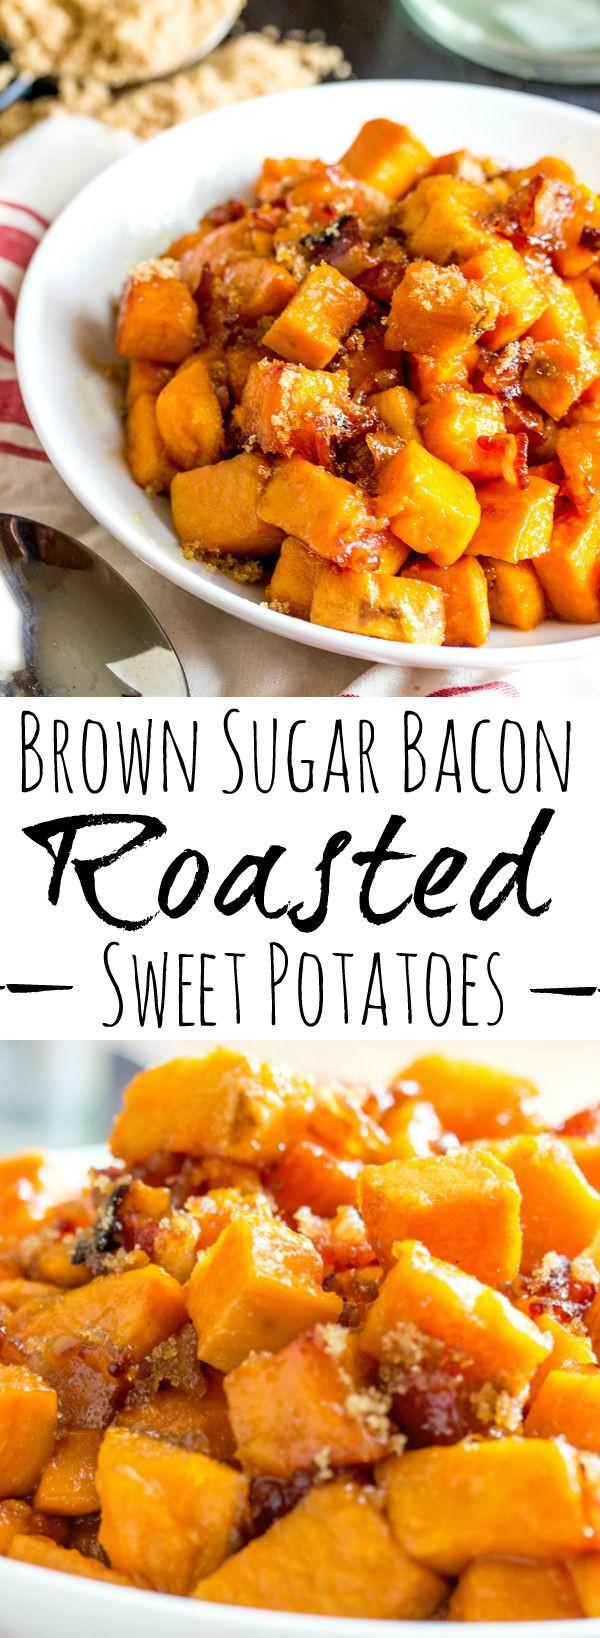 Sweet Potatoes For Thanksgiving  17 Best ideas about Sweet Potato Casserole on Pinterest